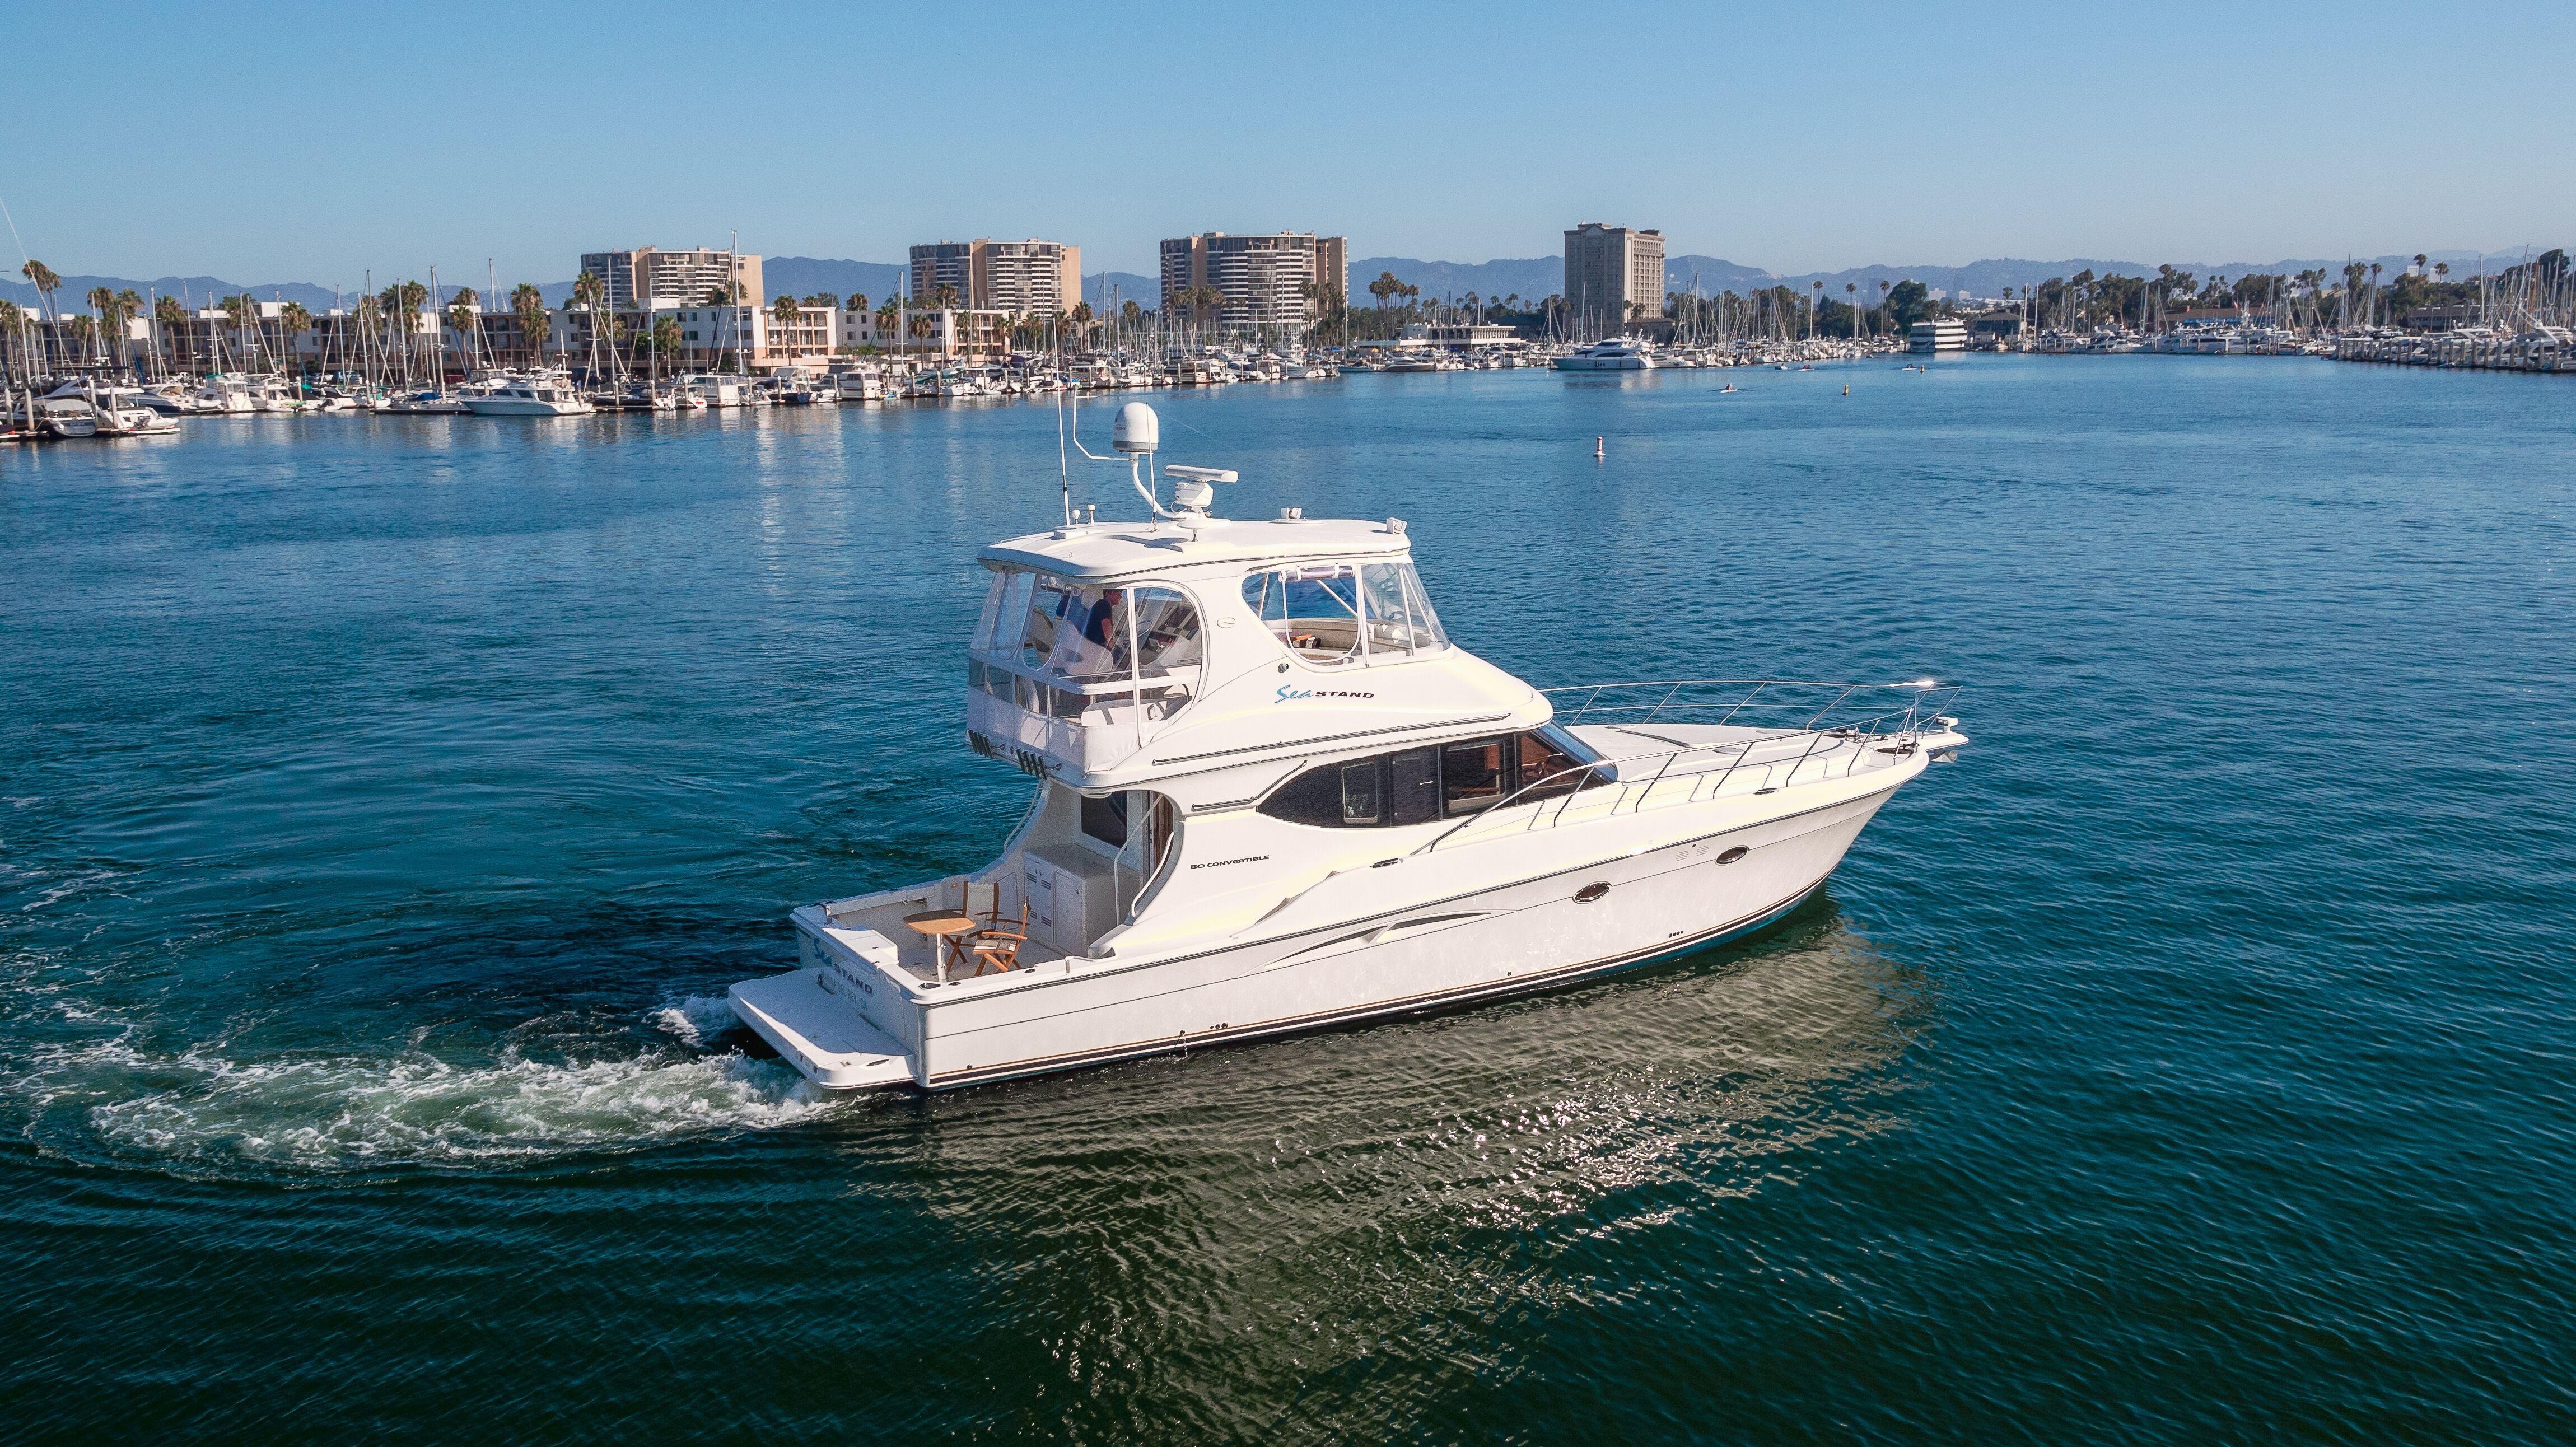 Used Silverton Sportfish & Cruisers for Sale - Silverton MLS